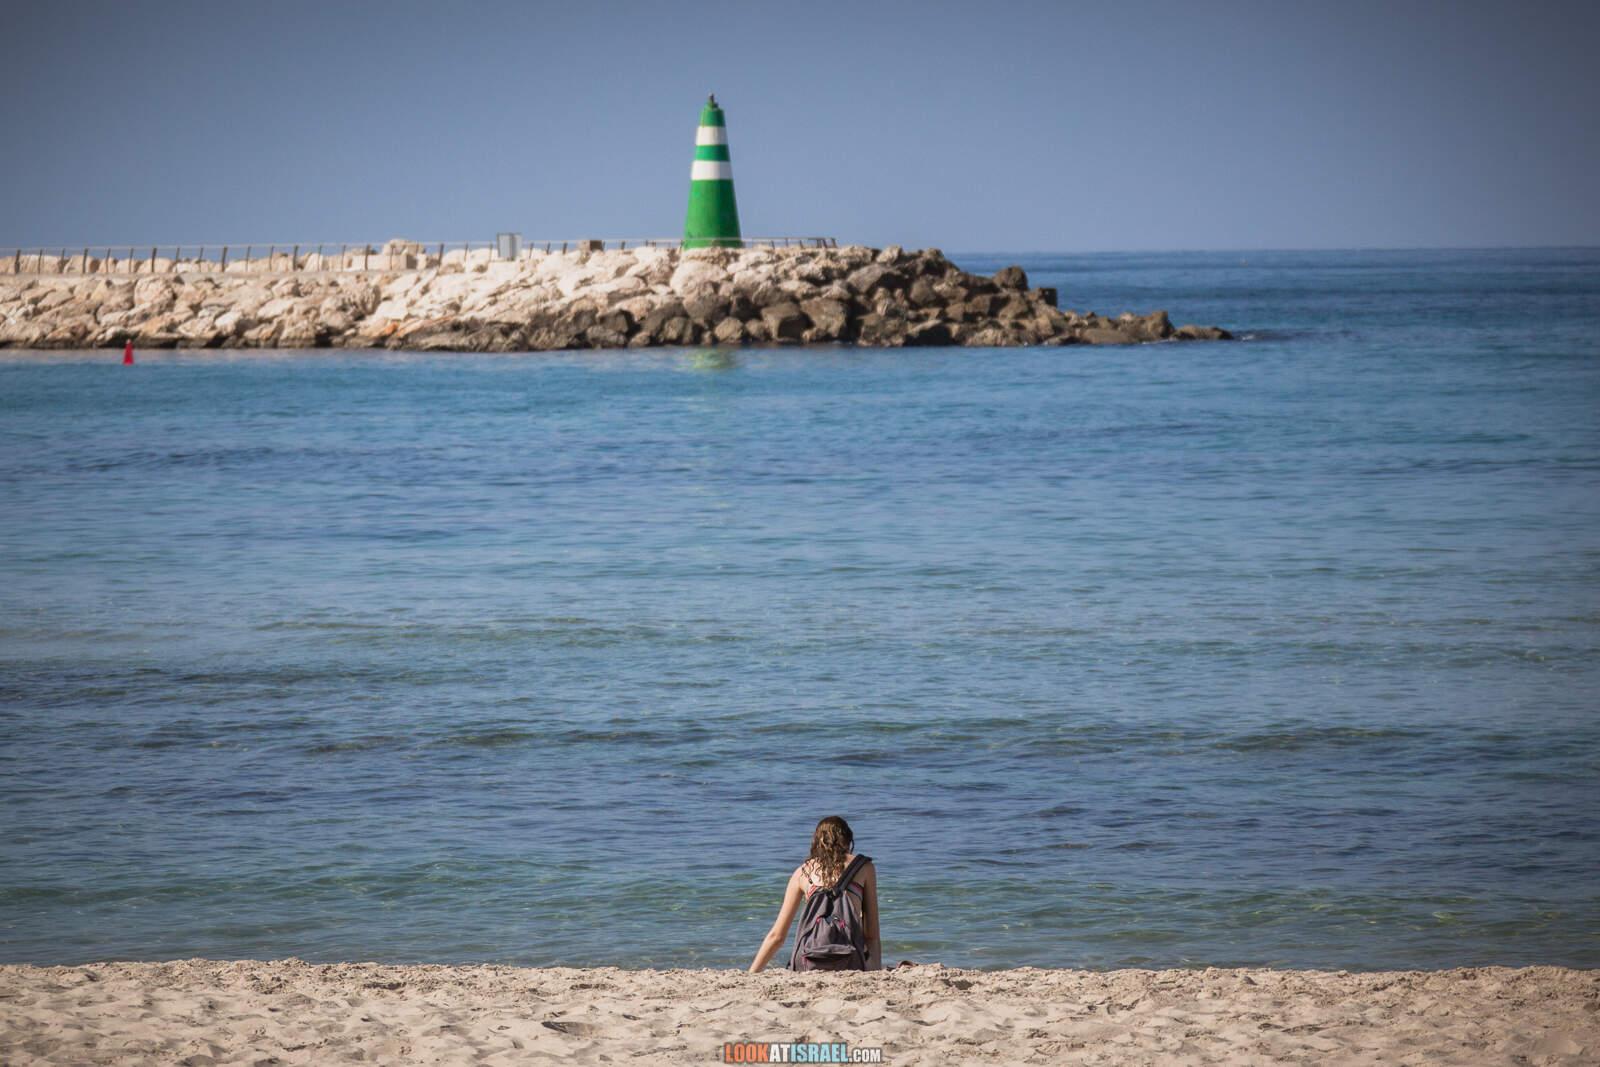 Пляжи и набережная Тель-Авива во время карантина   Lockdown on beaches of Tel Aviv   LookAtIsrael.com - Фото путешествия по Израилю